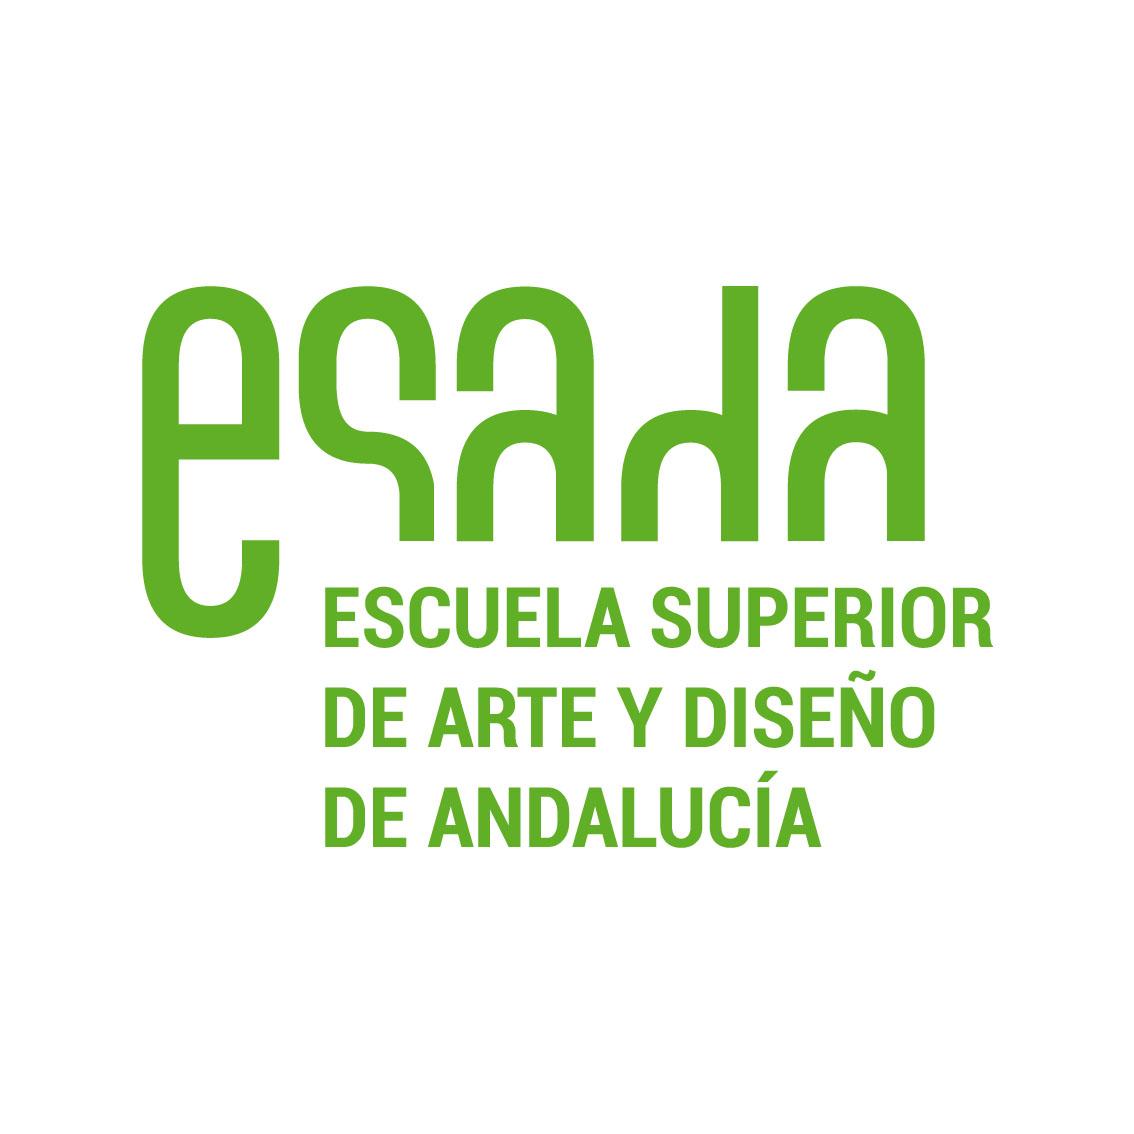 Diseño de Merchandising de Alonso Cano